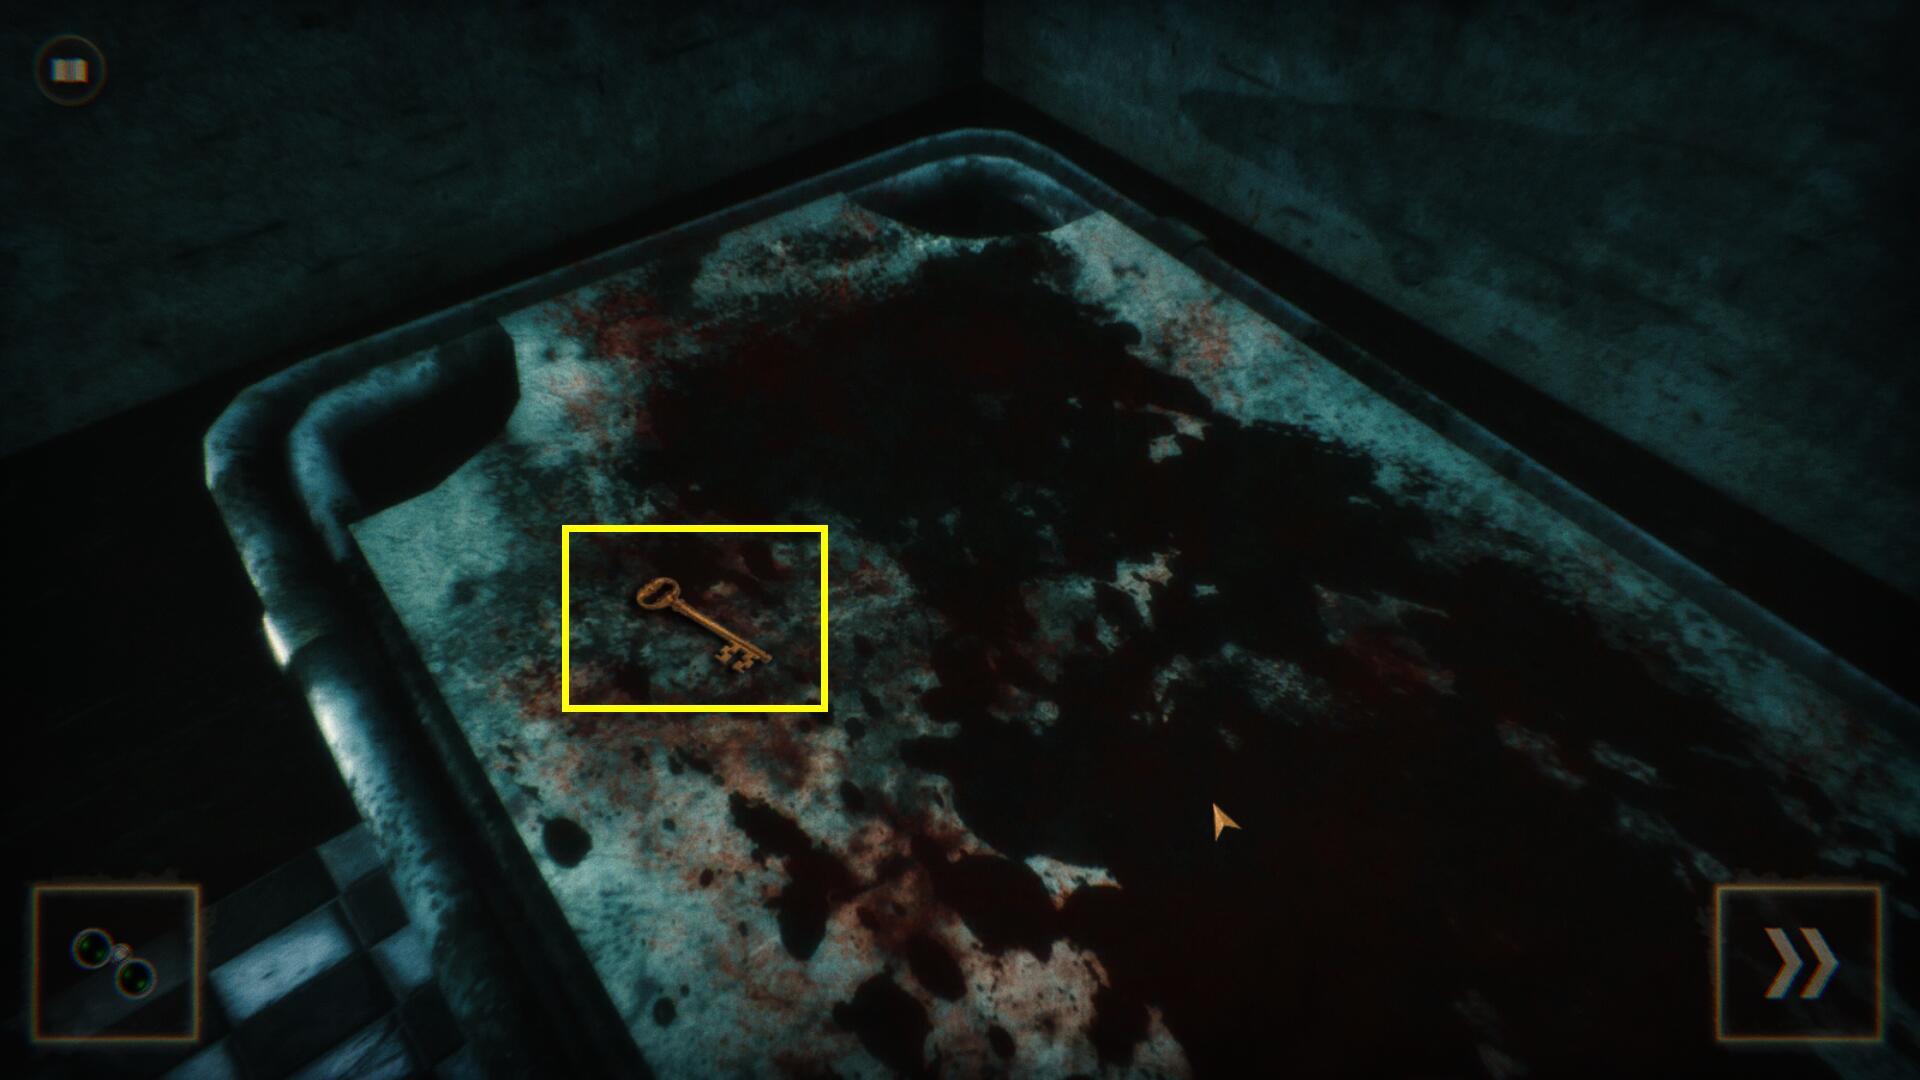 Darkroom游戏攻略 暗室简单难度第二章